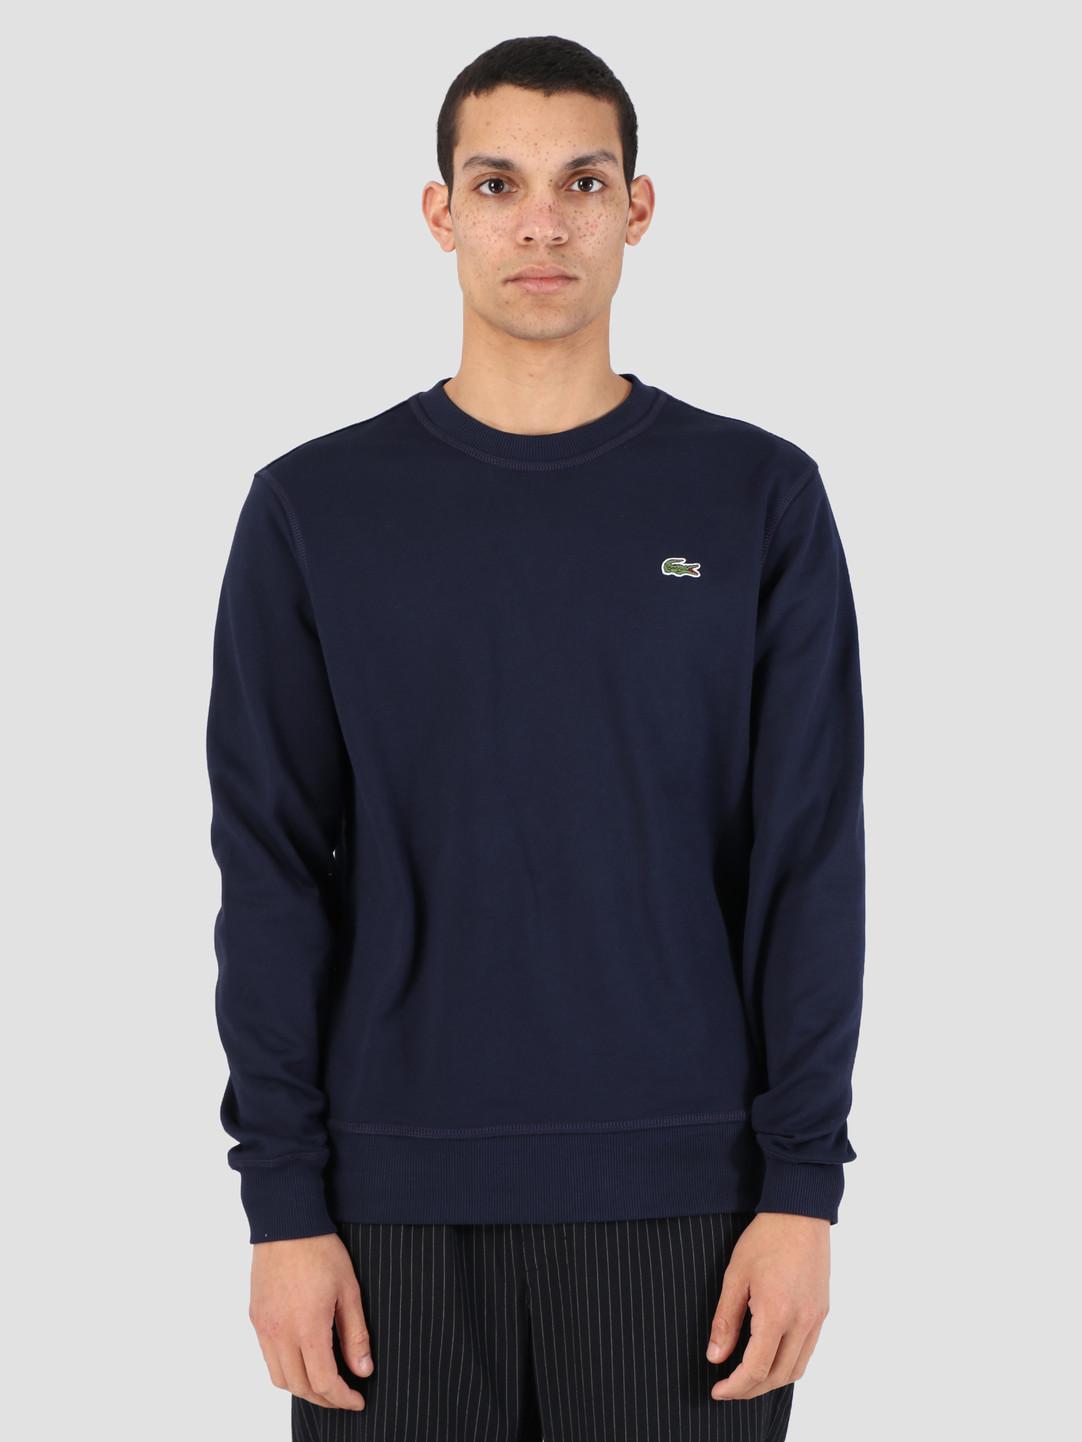 83 1hs1 Sh9075 Lacoste Marine 08a Sweatshirt Mari Rq5A4Lcj3S